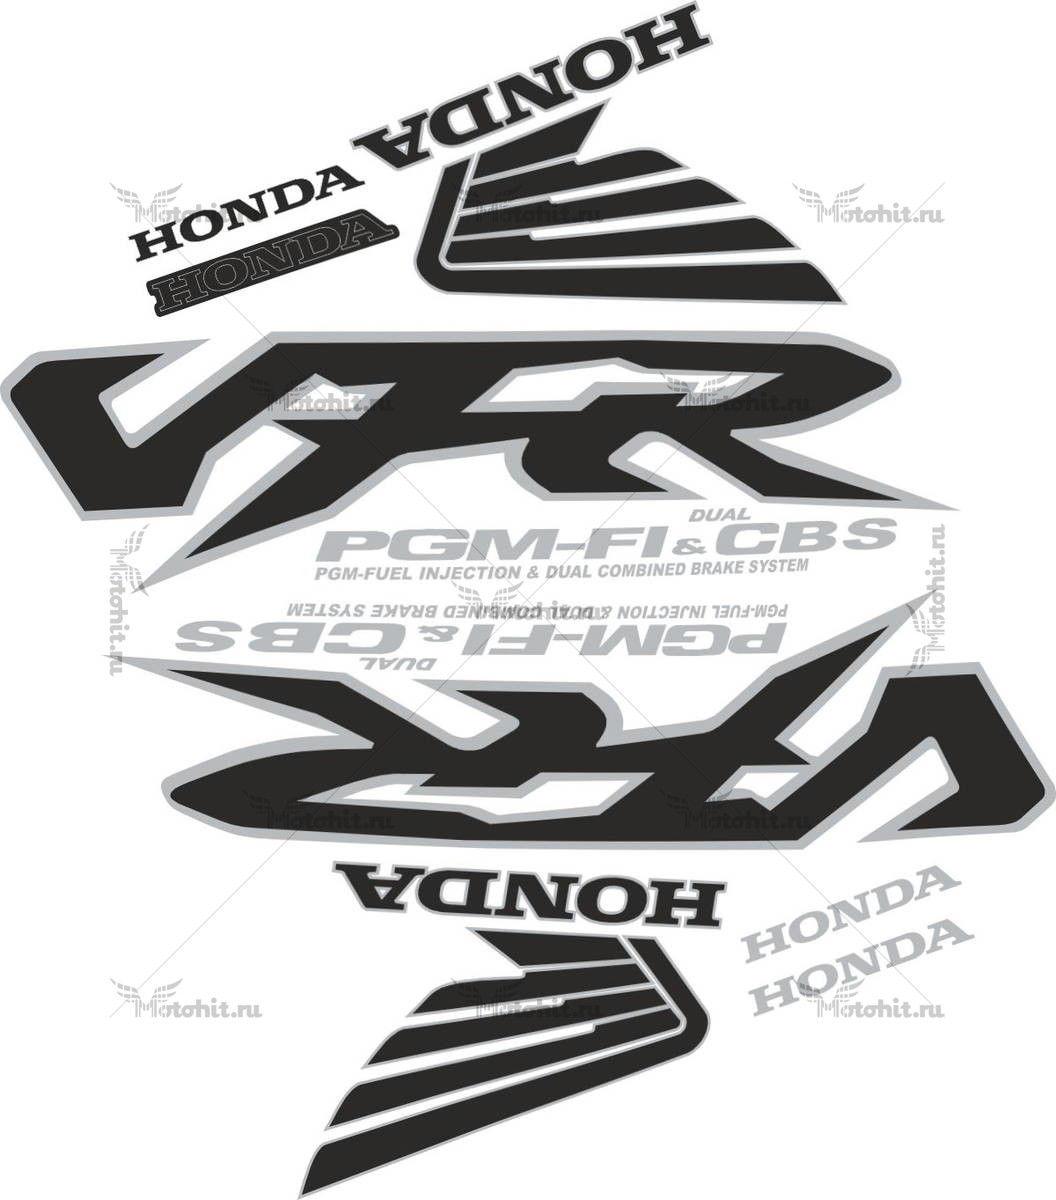 Комплект наклеек Honda VFR-800i 1998-2001